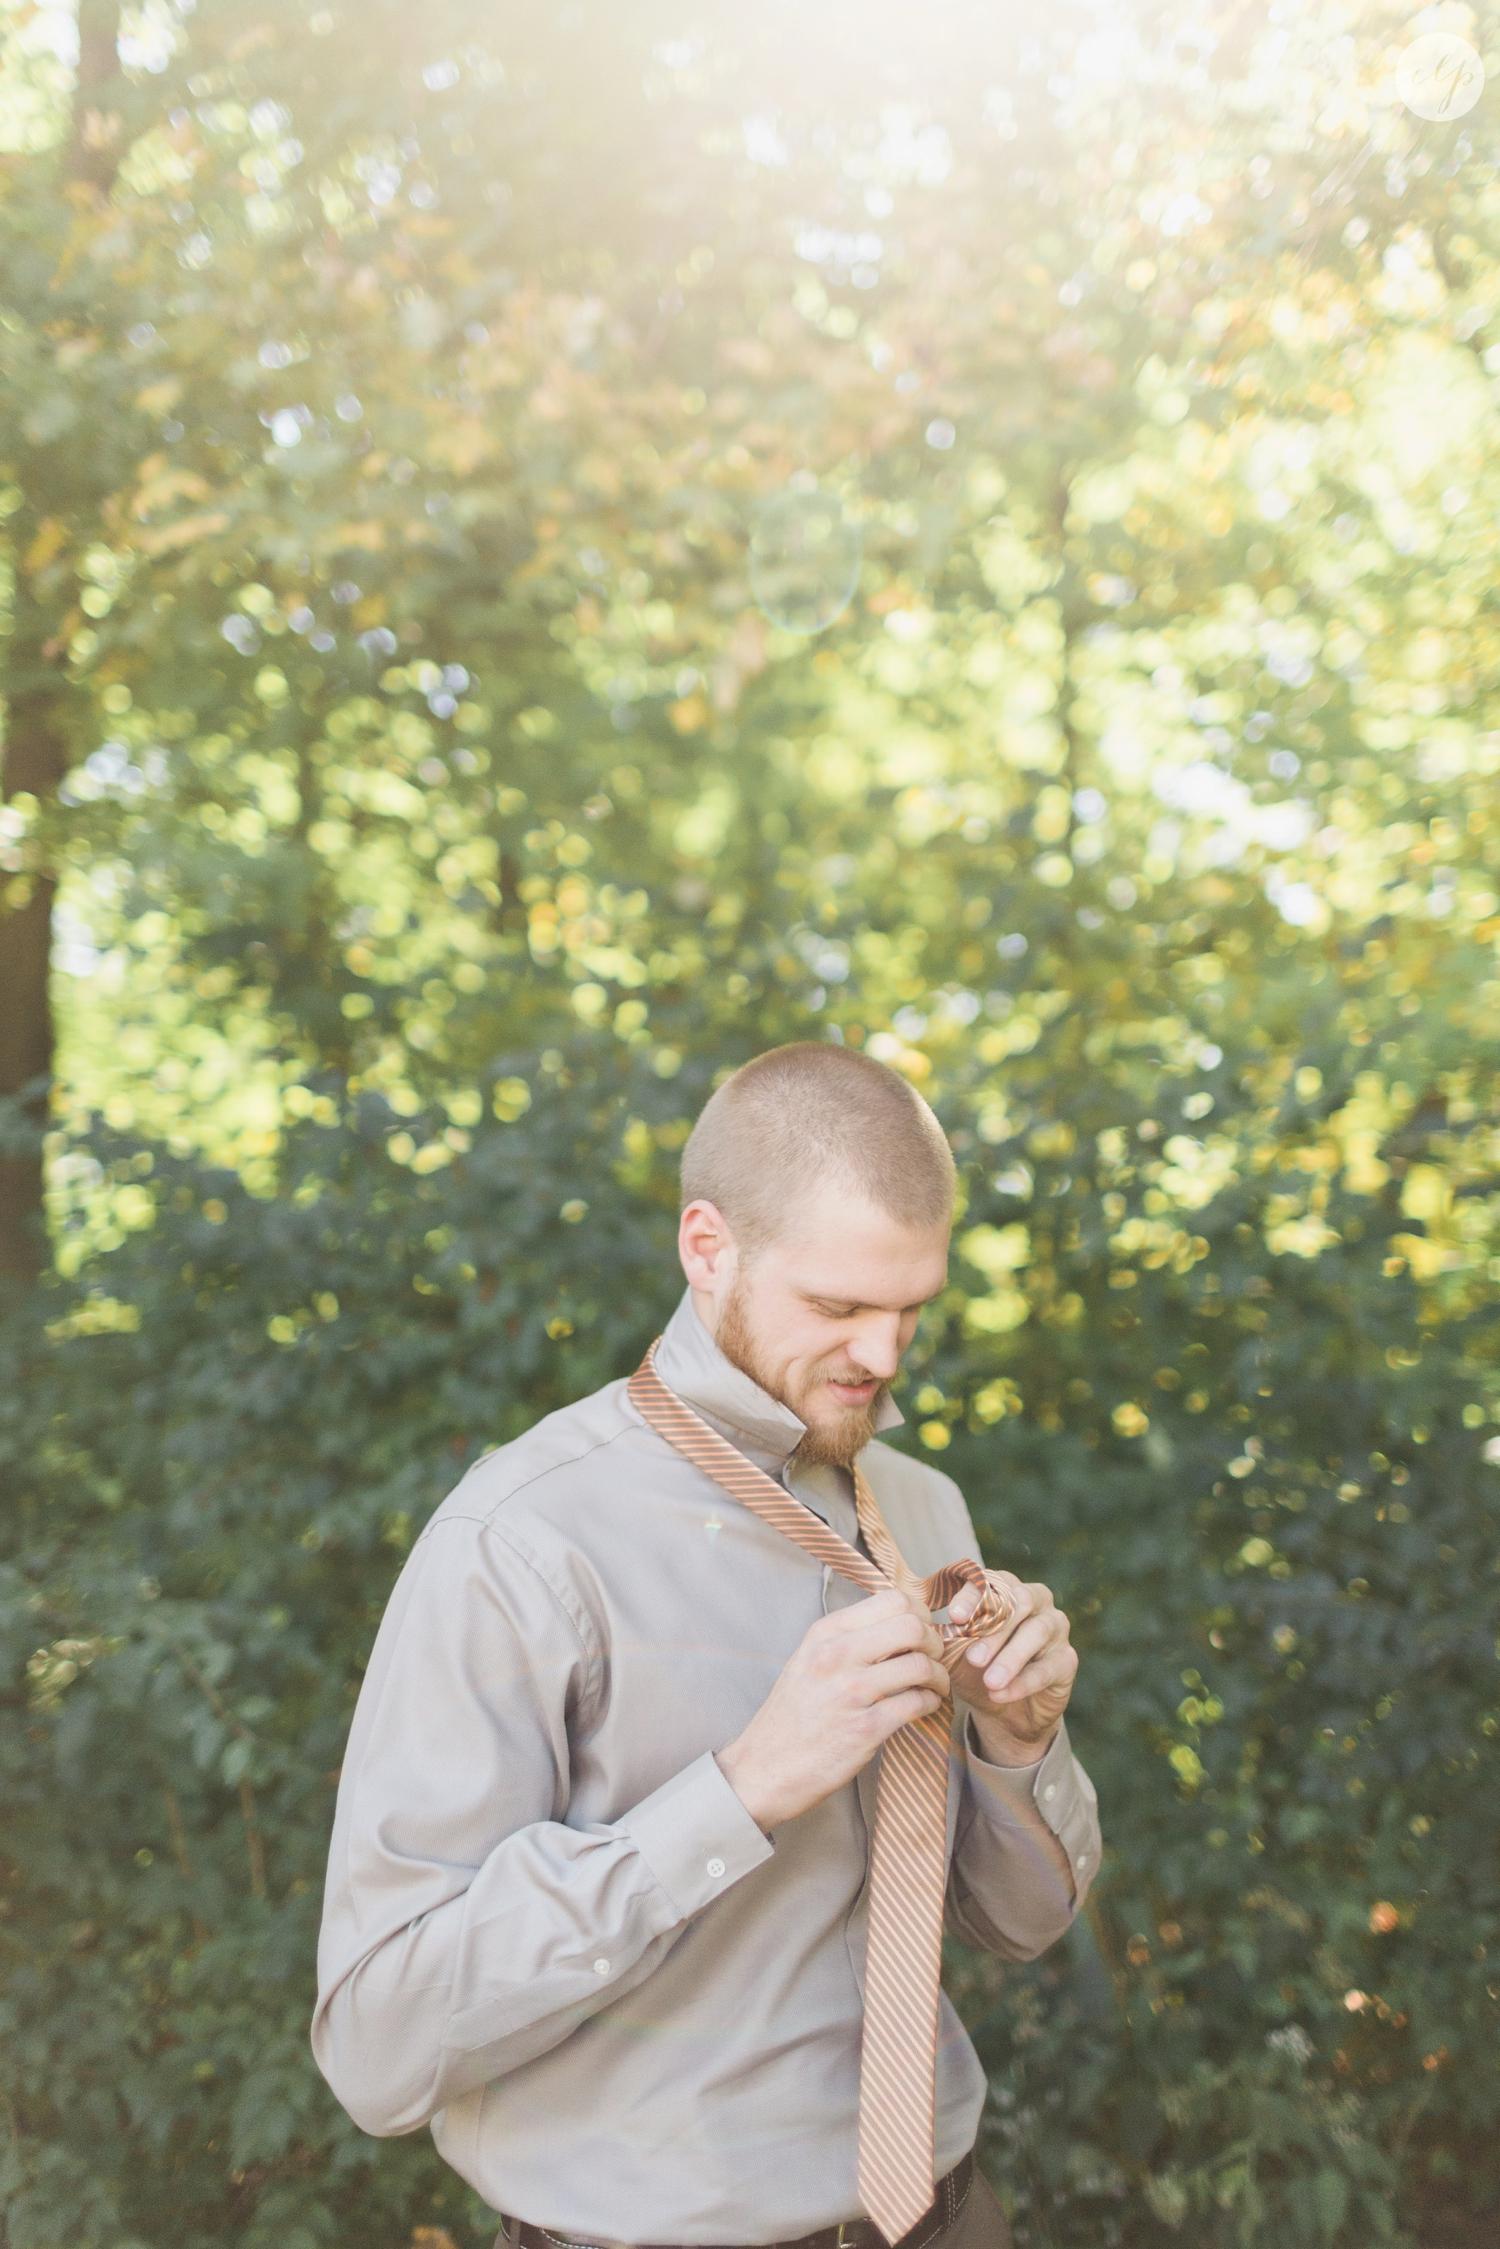 Outdoor-Wedding-in-the-Woods-Photography_4194.jpg